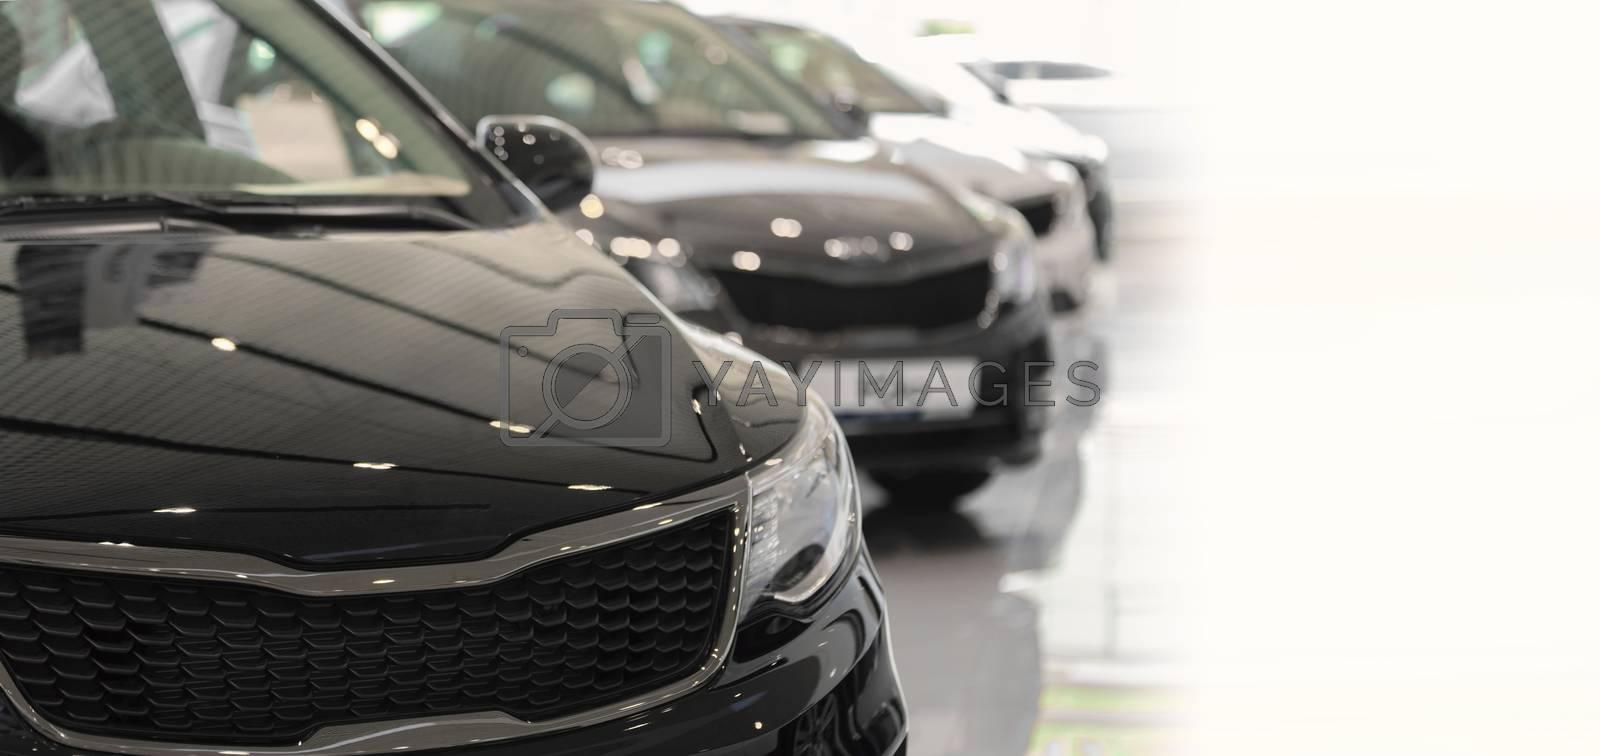 Car sales. Automobile in sales salon. Market place